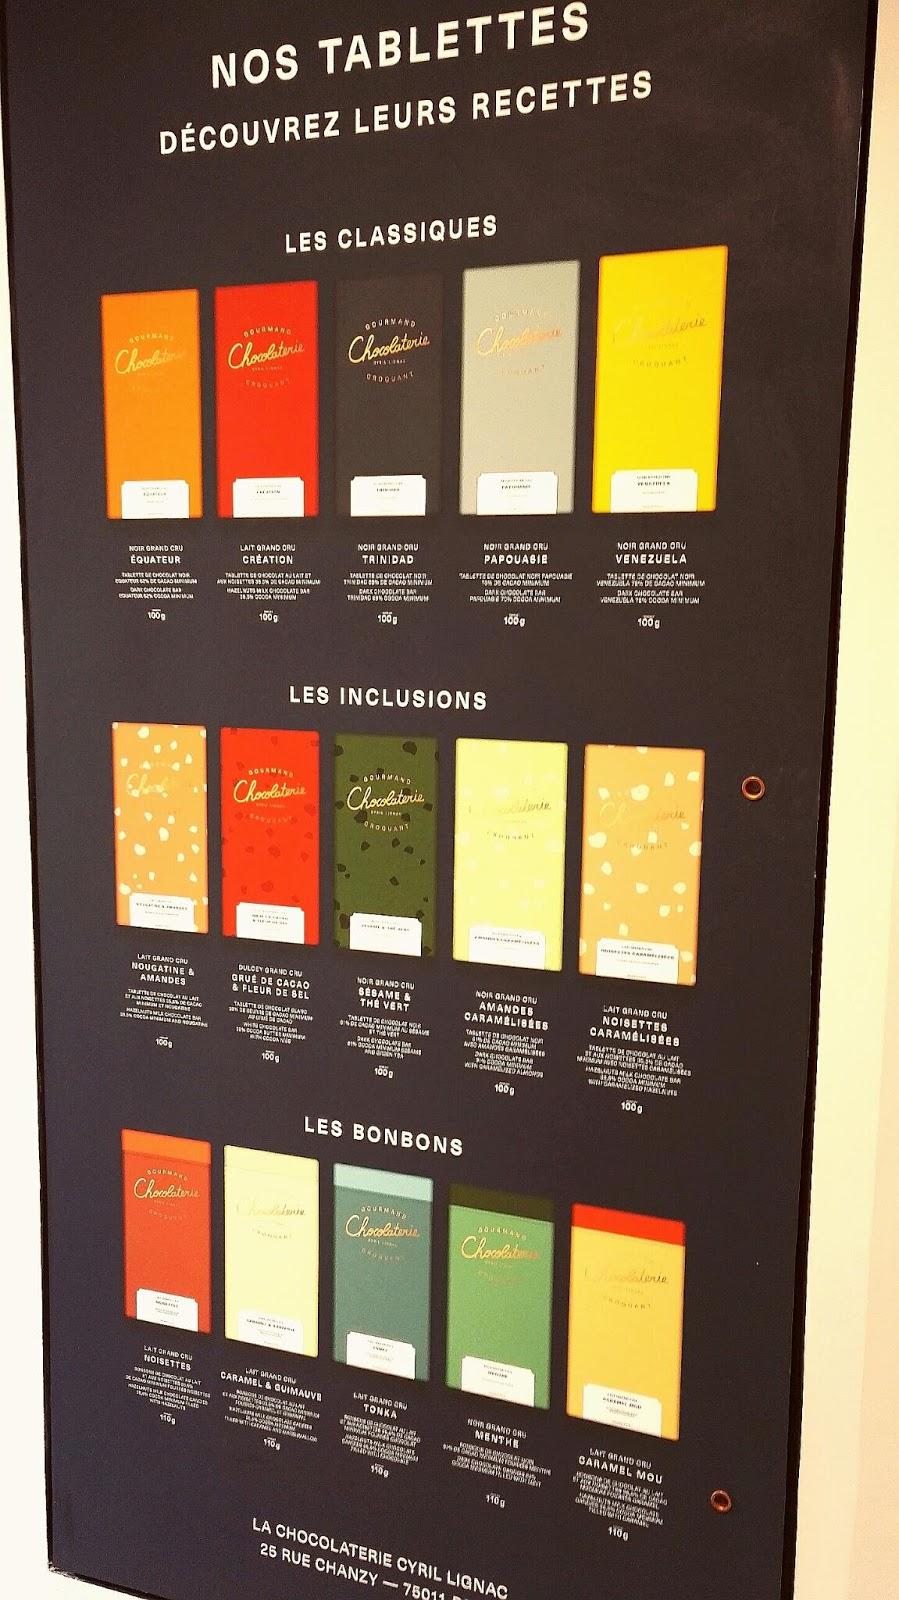 Les tasters: la chocolaterie cyril lignac